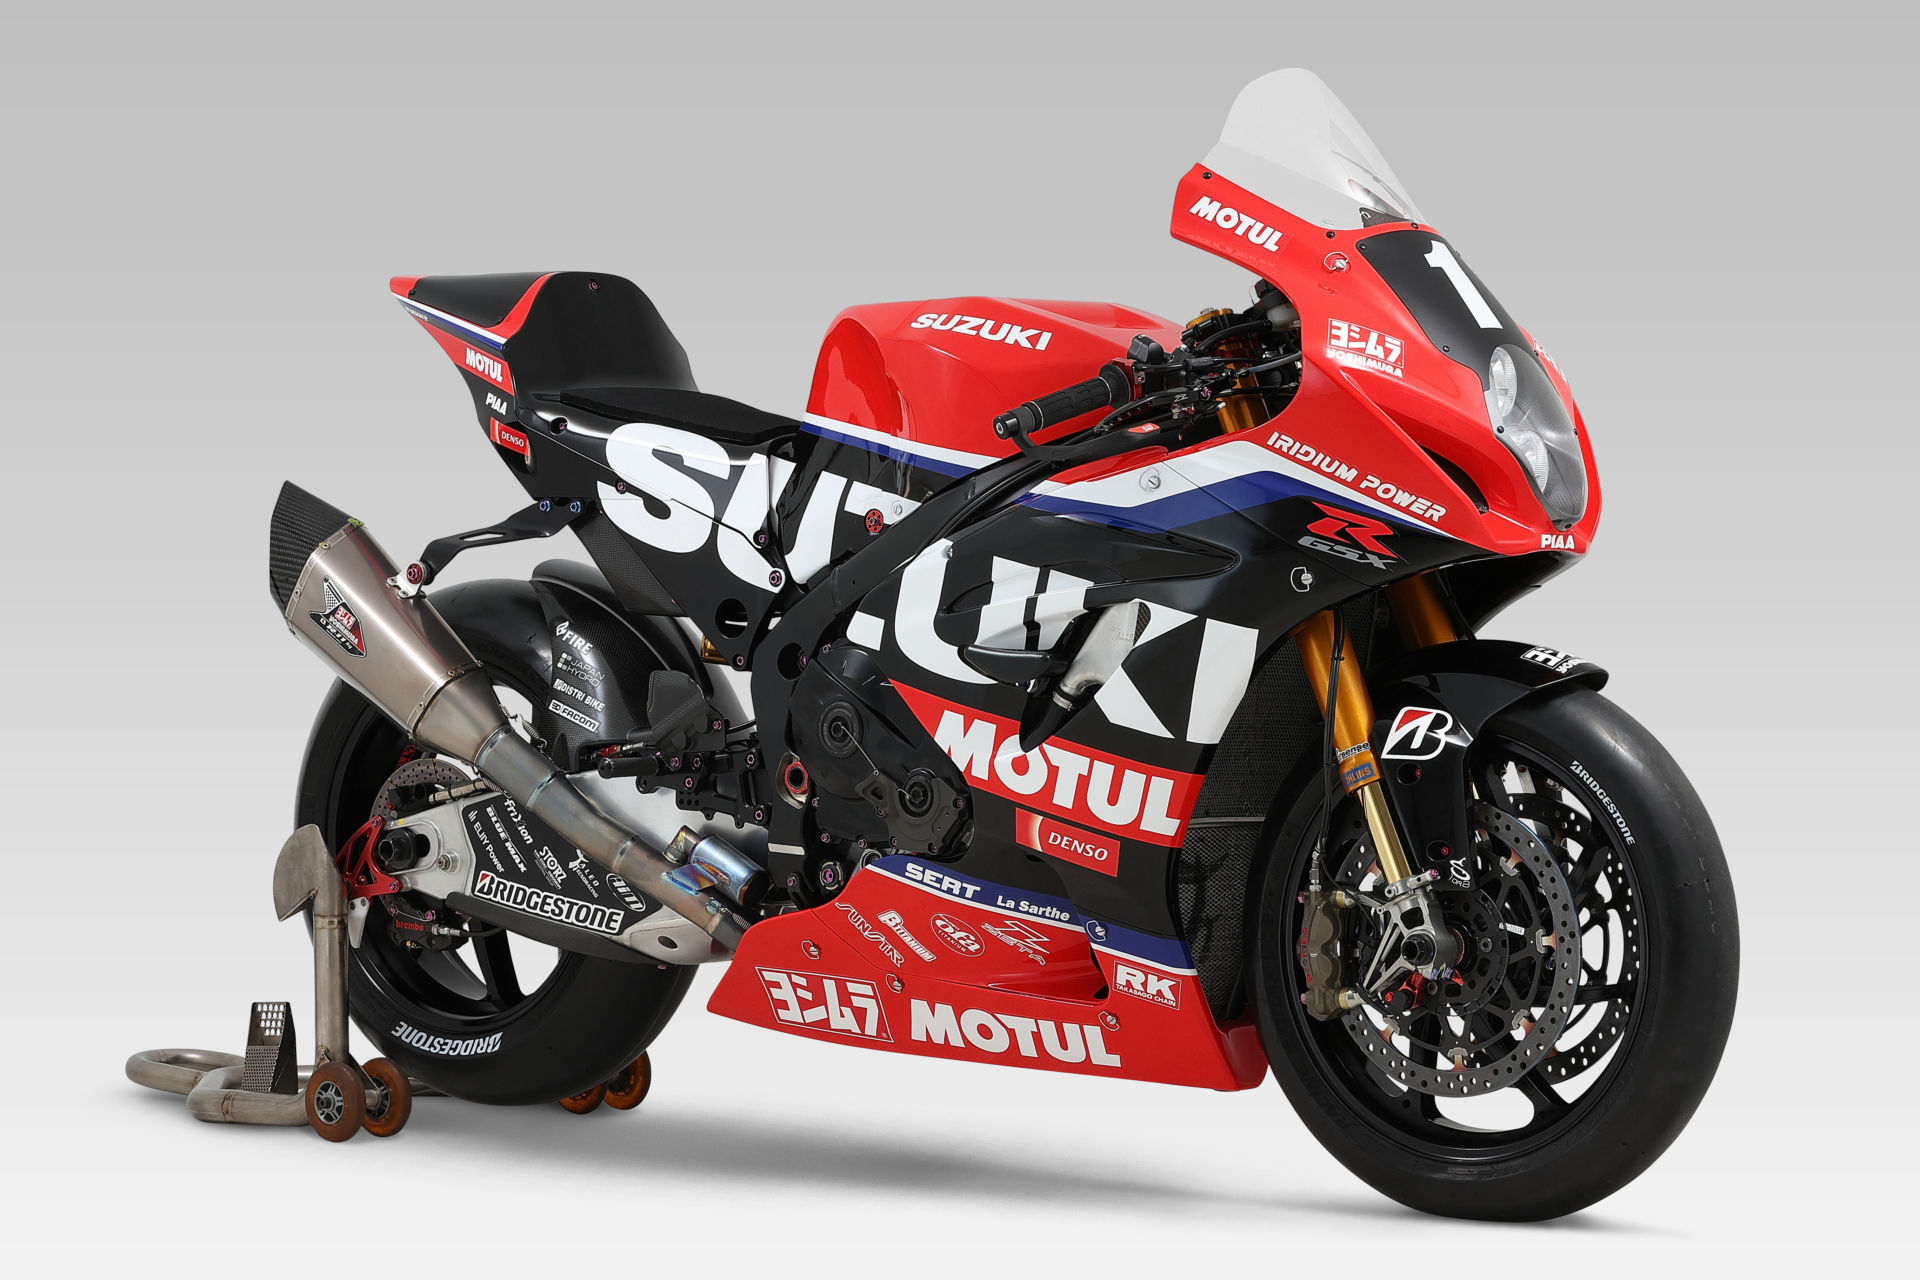 The Team Yoshimura SERT Motul Suzuki GSX-R1000 endurance racebike. Photo courtesy Team Suzuki Press Office.